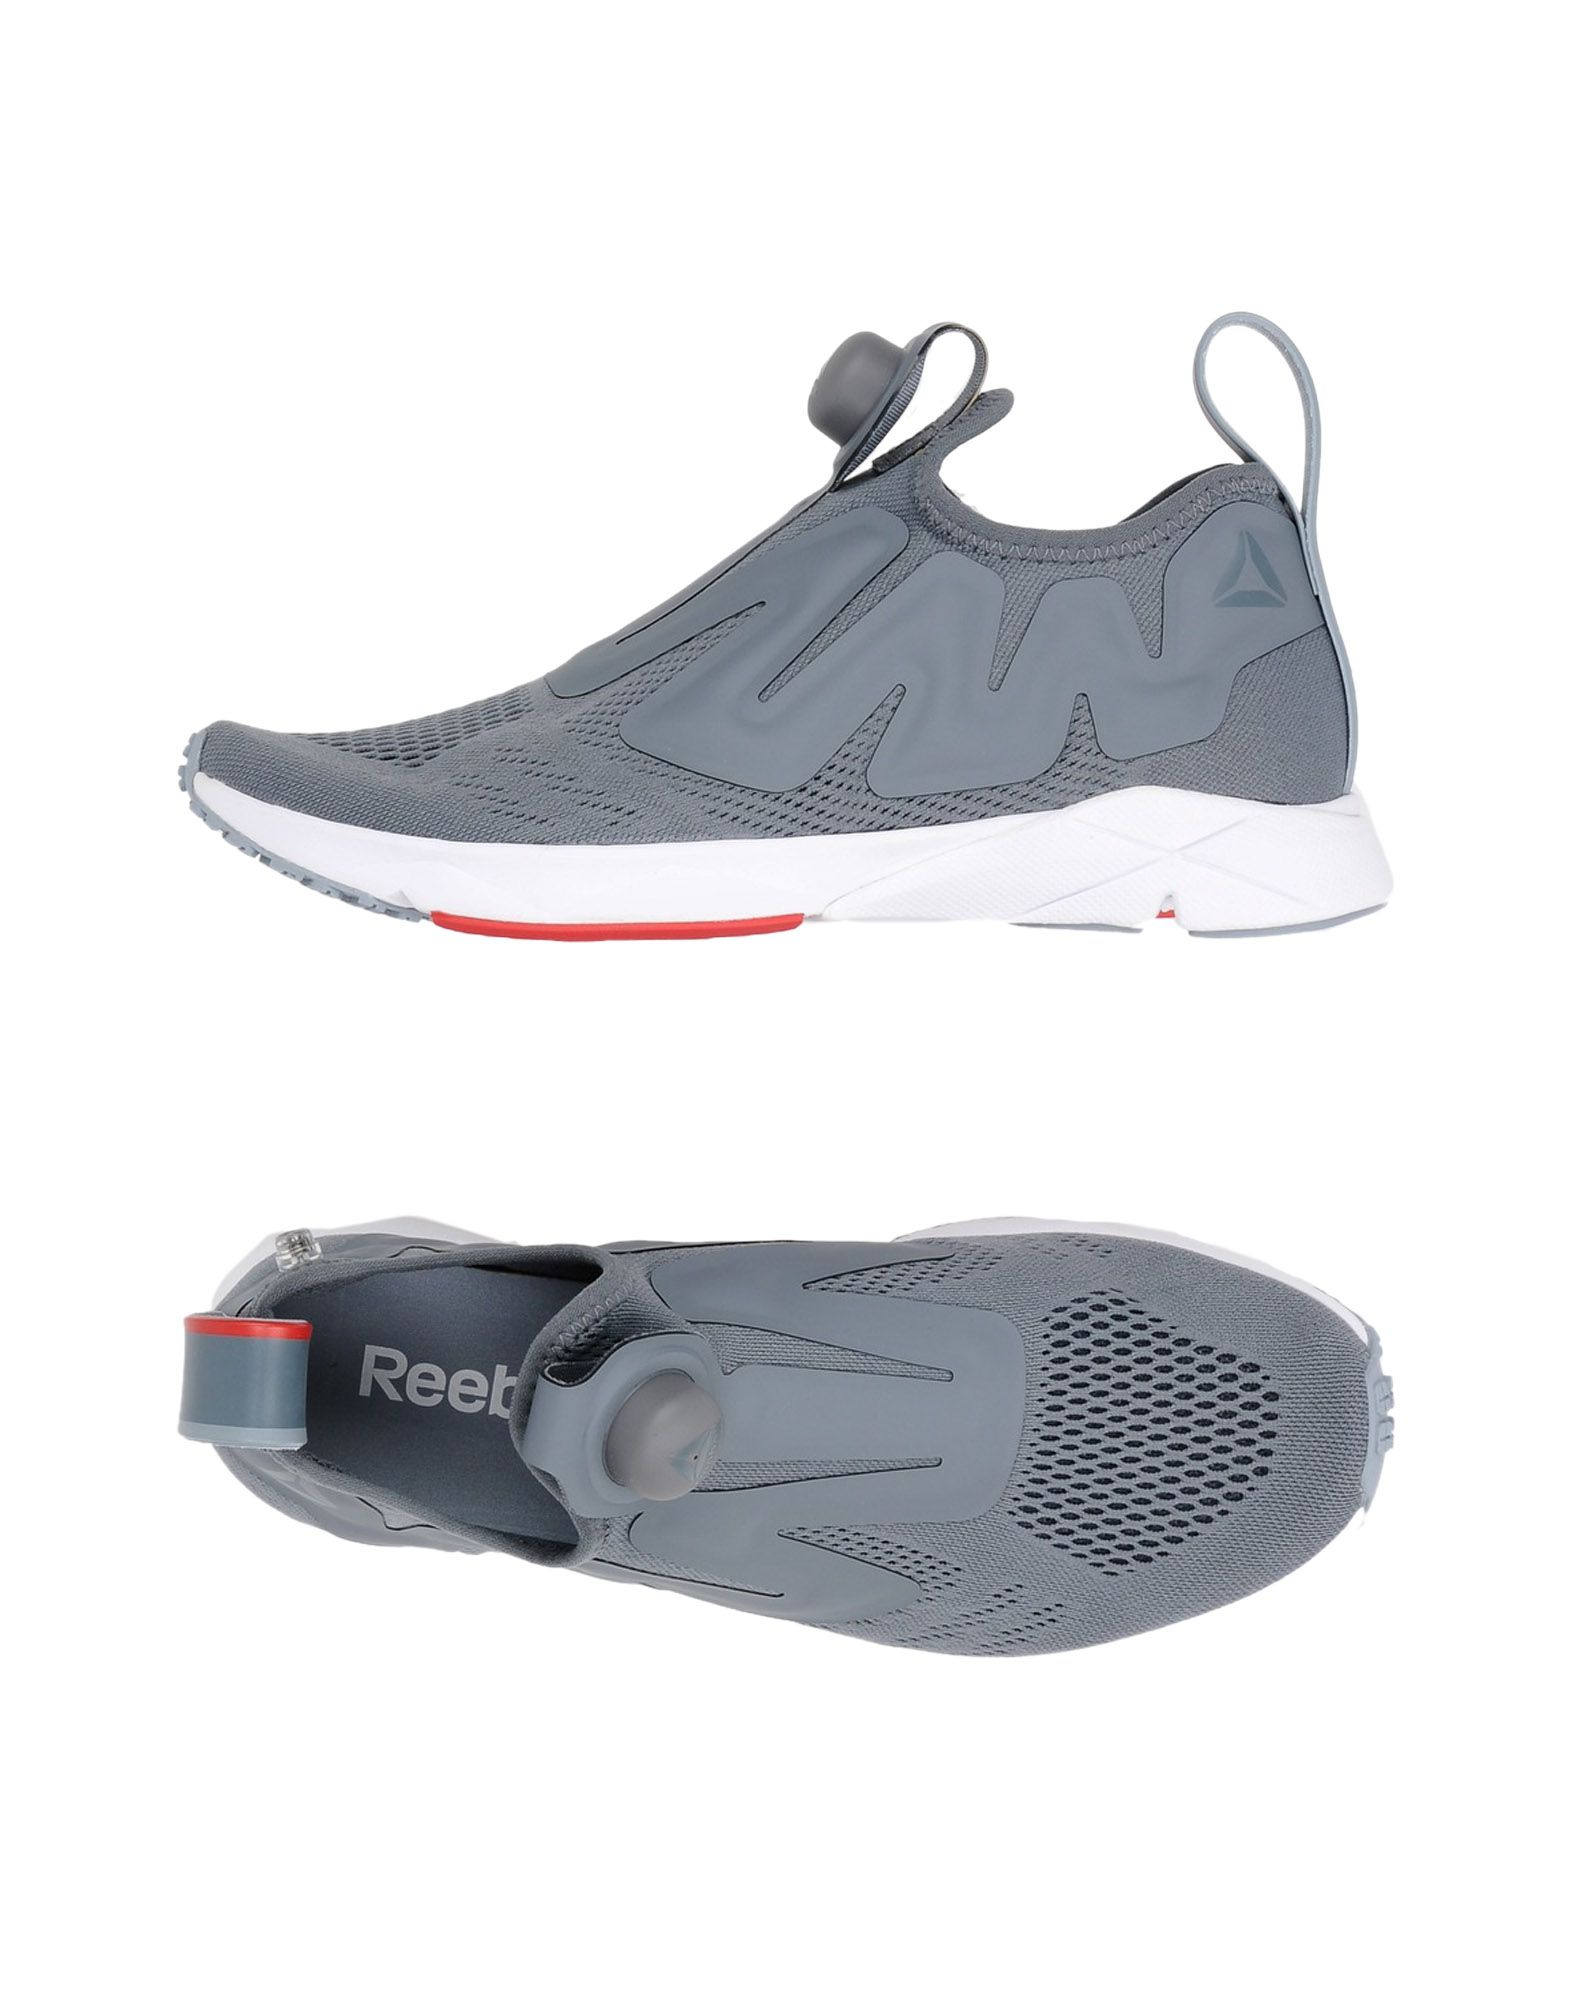 brooks низкие кеды и кроссовки REEBOK Низкие кеды и кроссовки